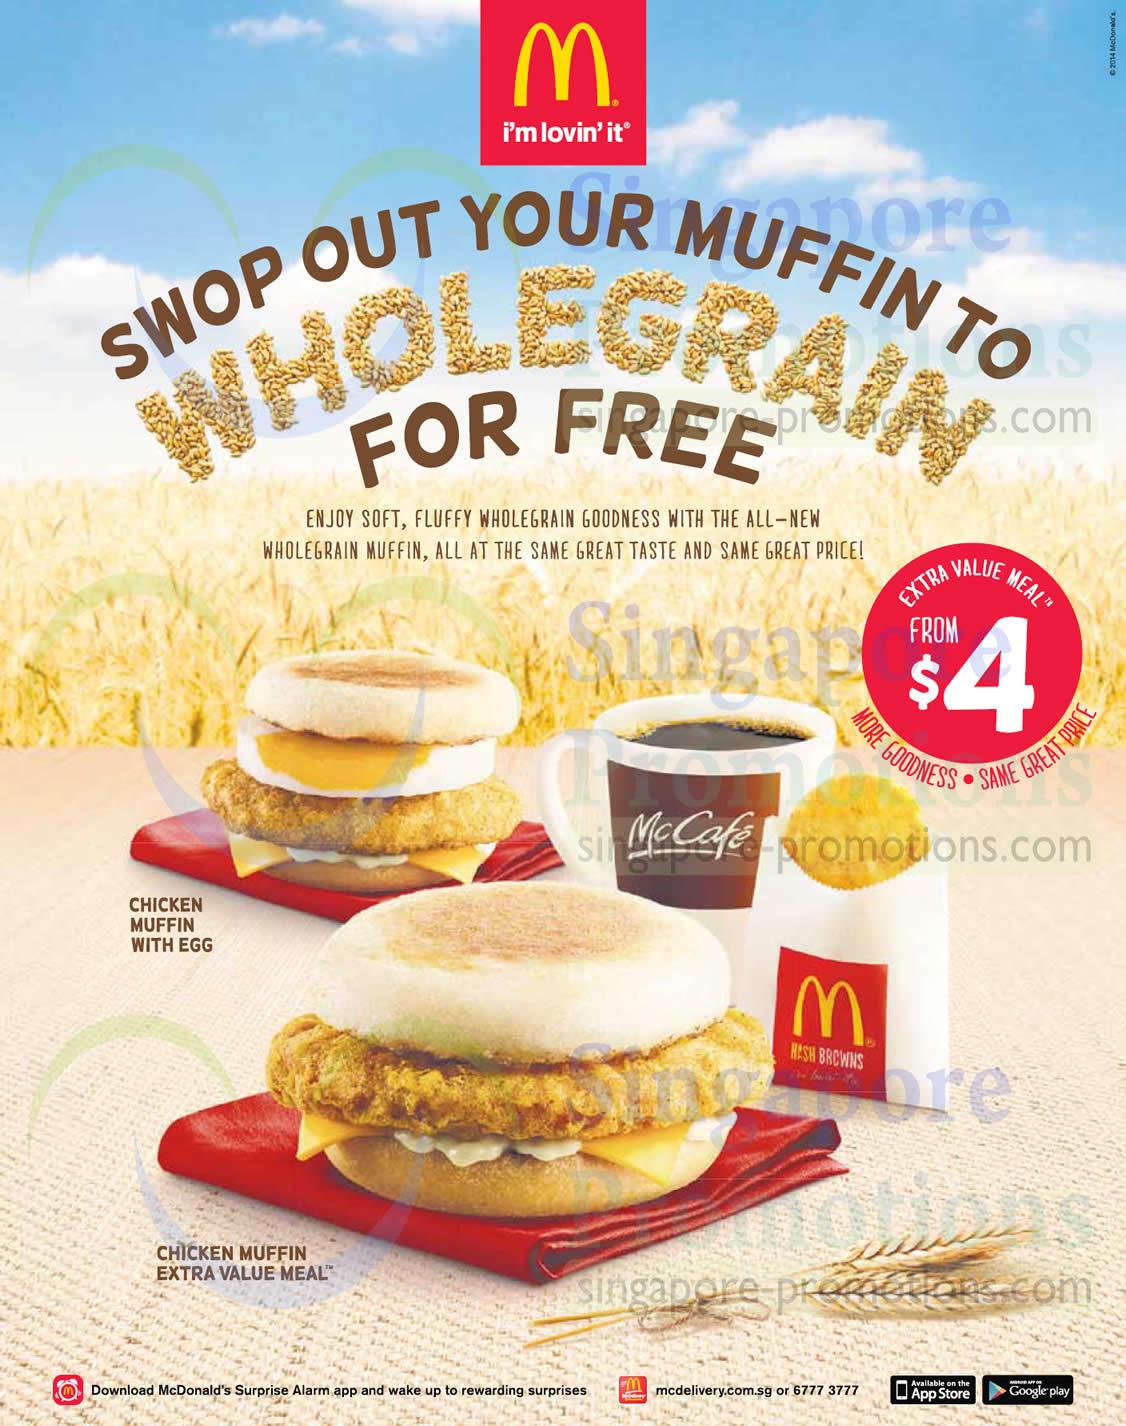 mcdonalds coupons november 2019